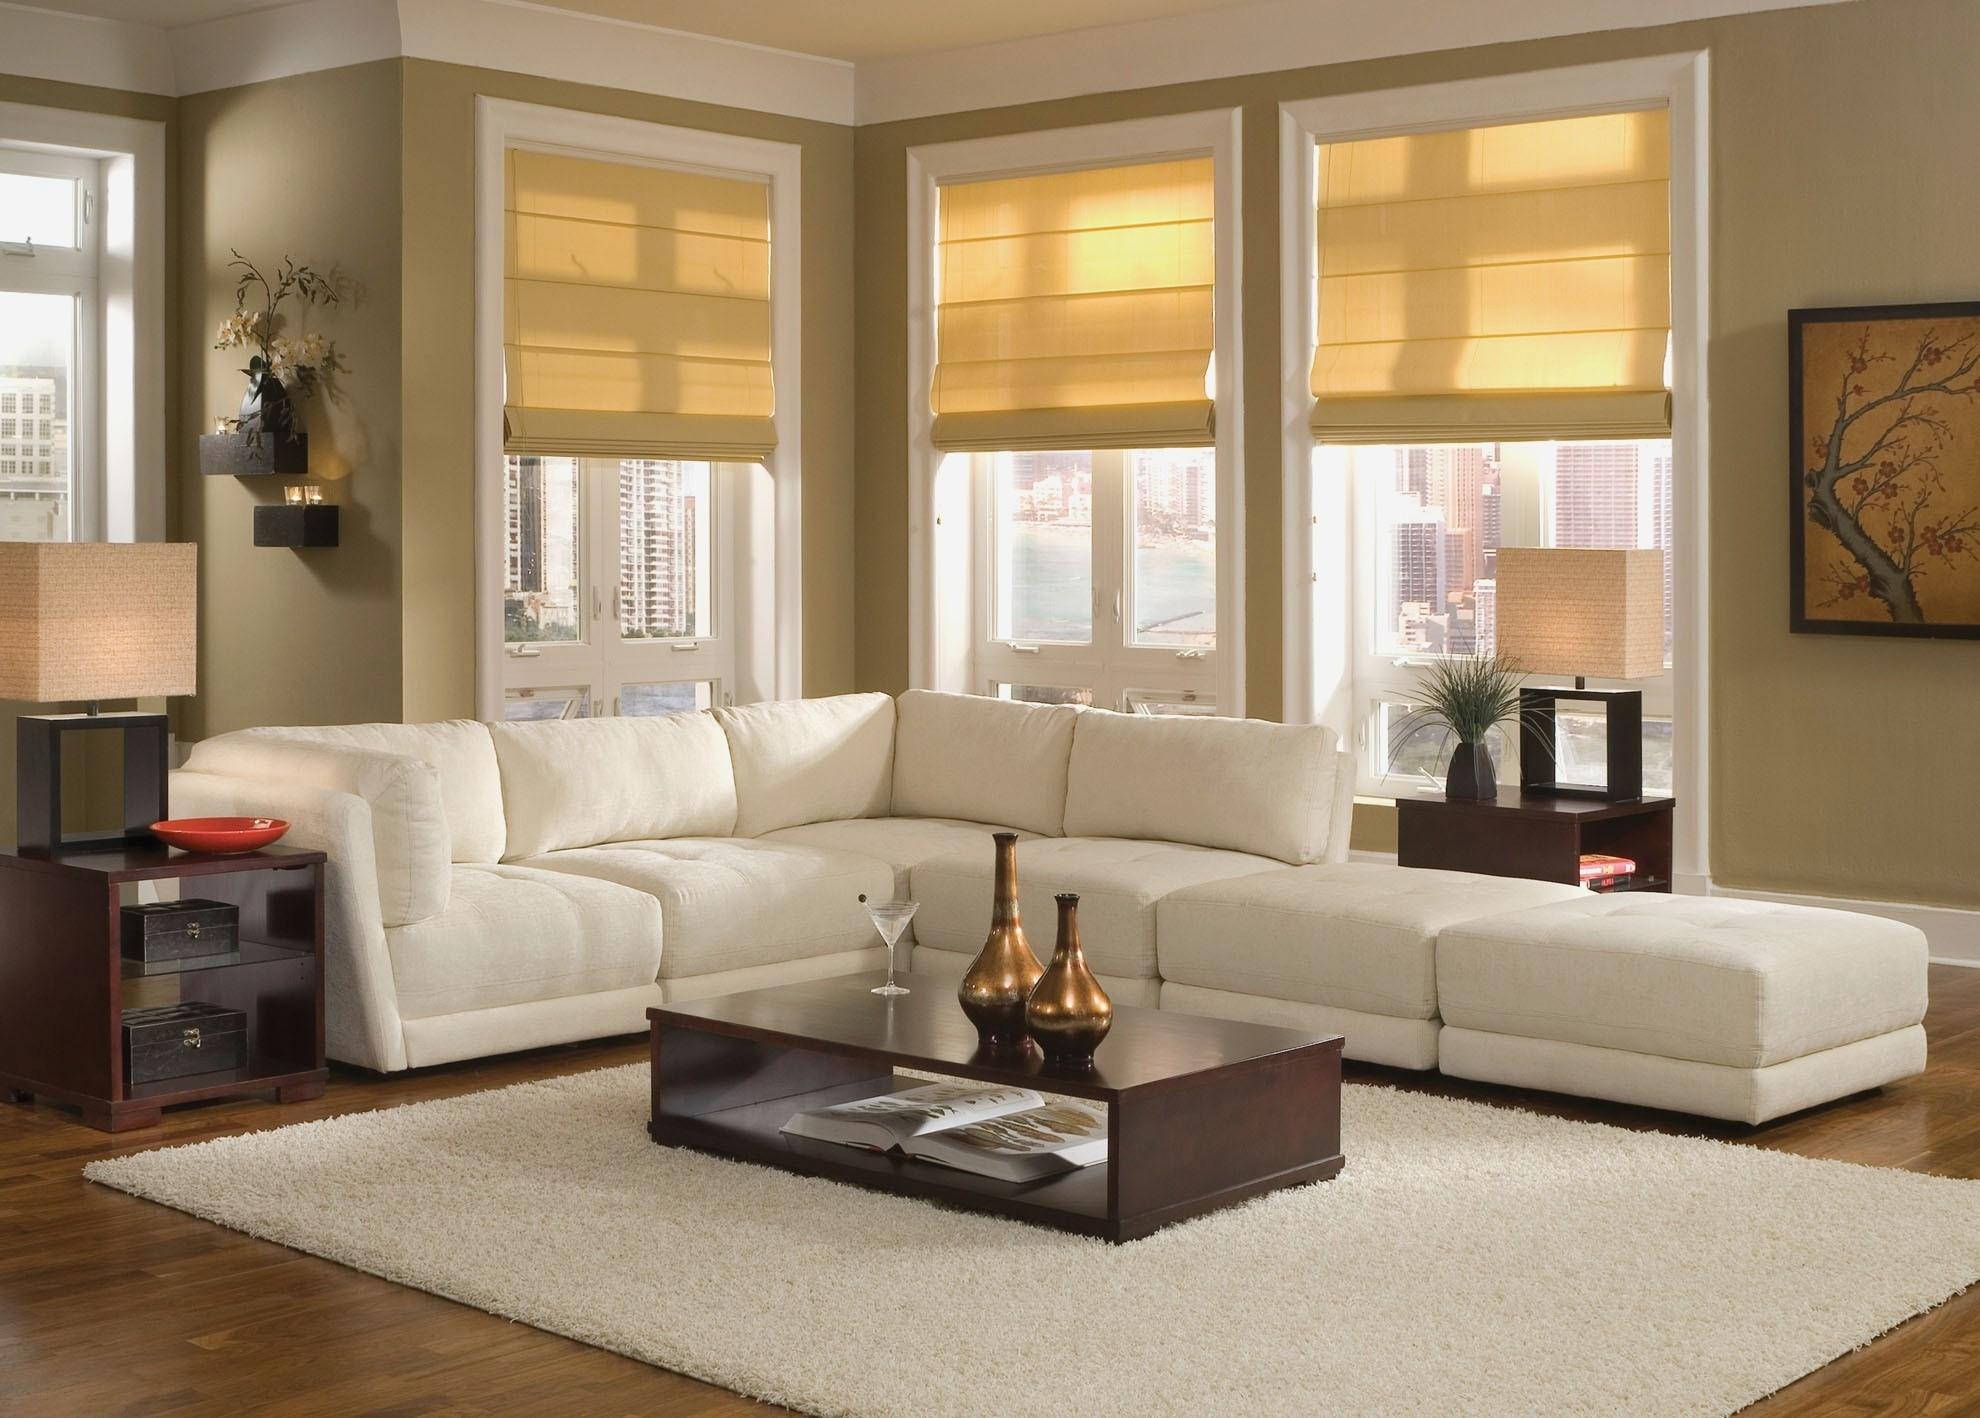 Living Room : Houzz Living Room Sofas Houzz Traditional Living Room with regard to Houzz Sectional Sofas (Image 9 of 10)